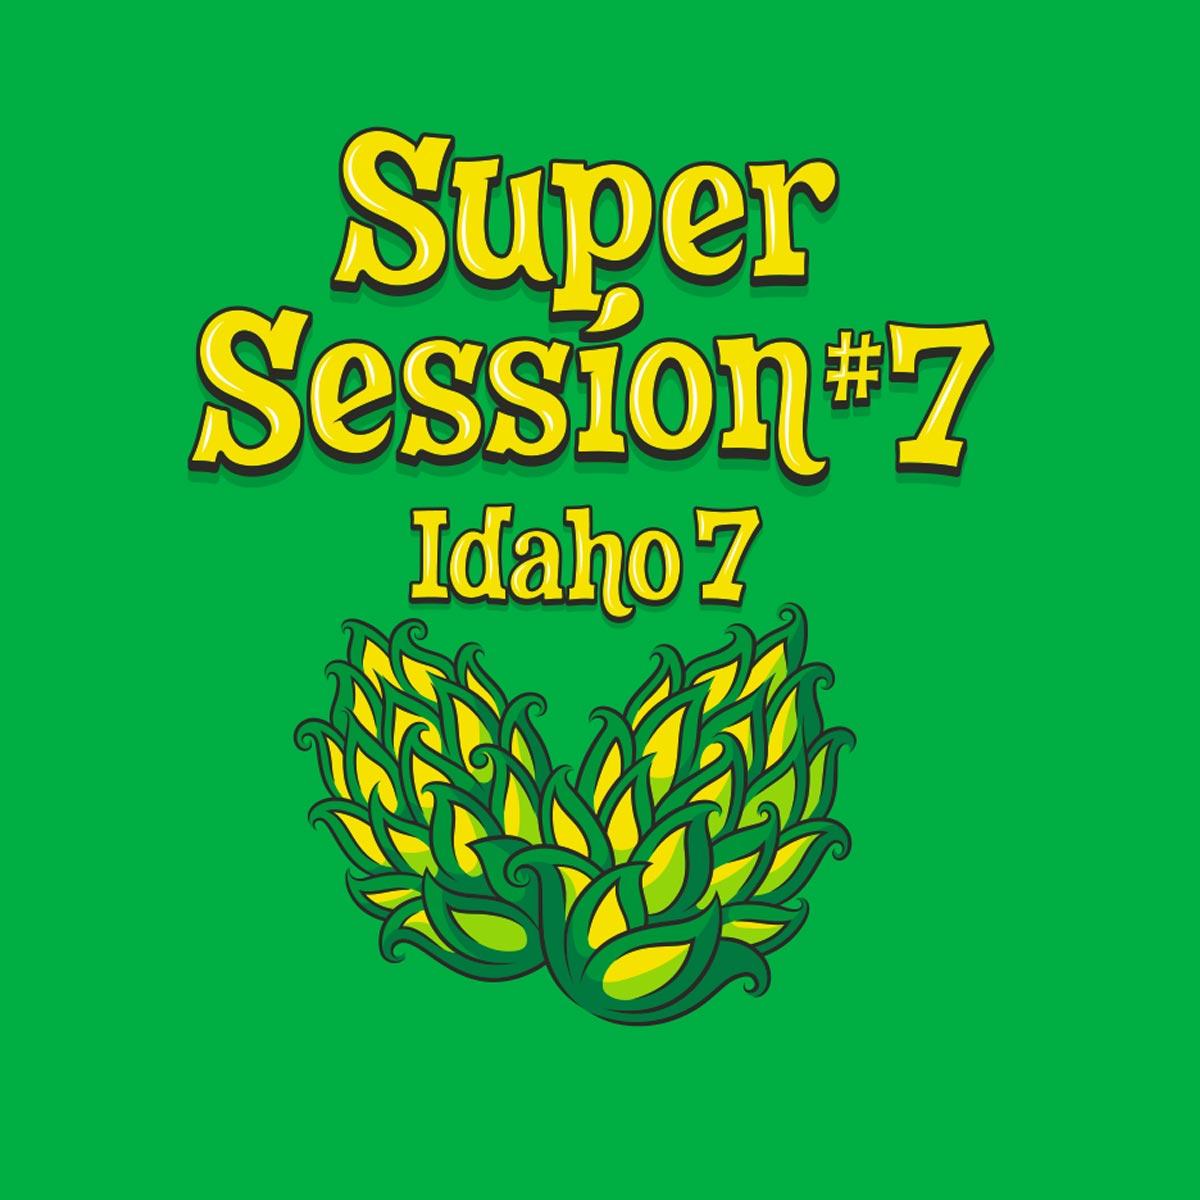 Super Session #7 - Idaho 7